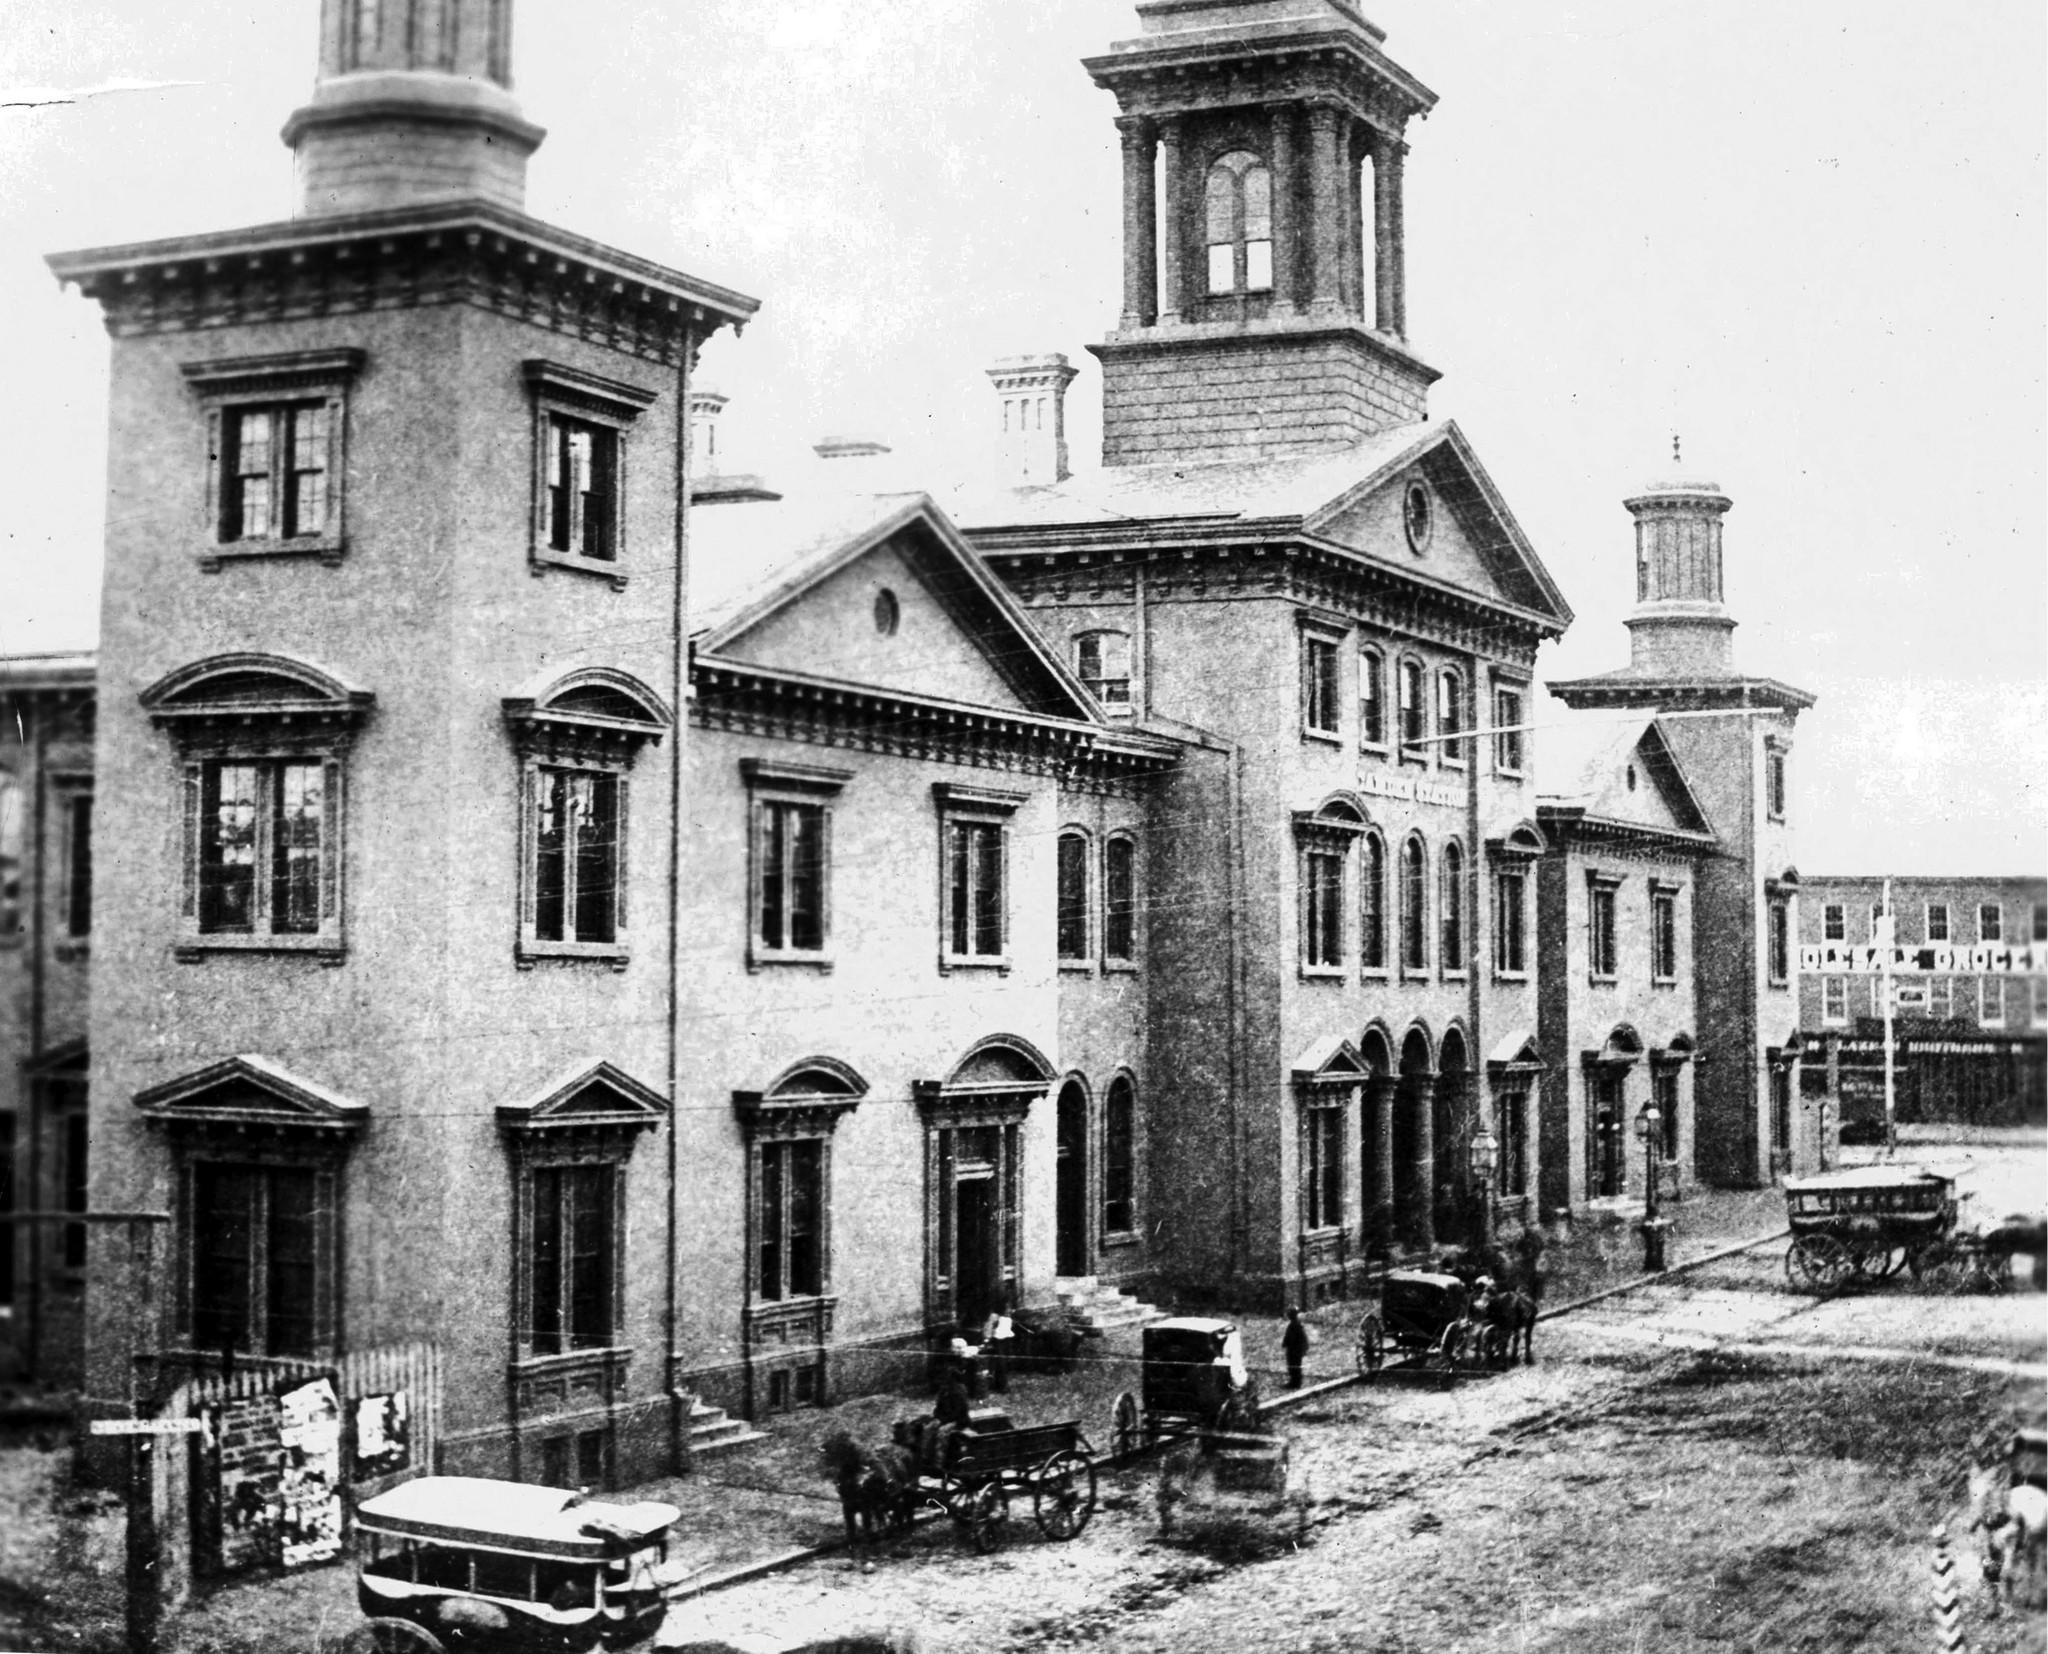 Camden Station Baltimore, Maryland Date: 1868. Source: Unknown.